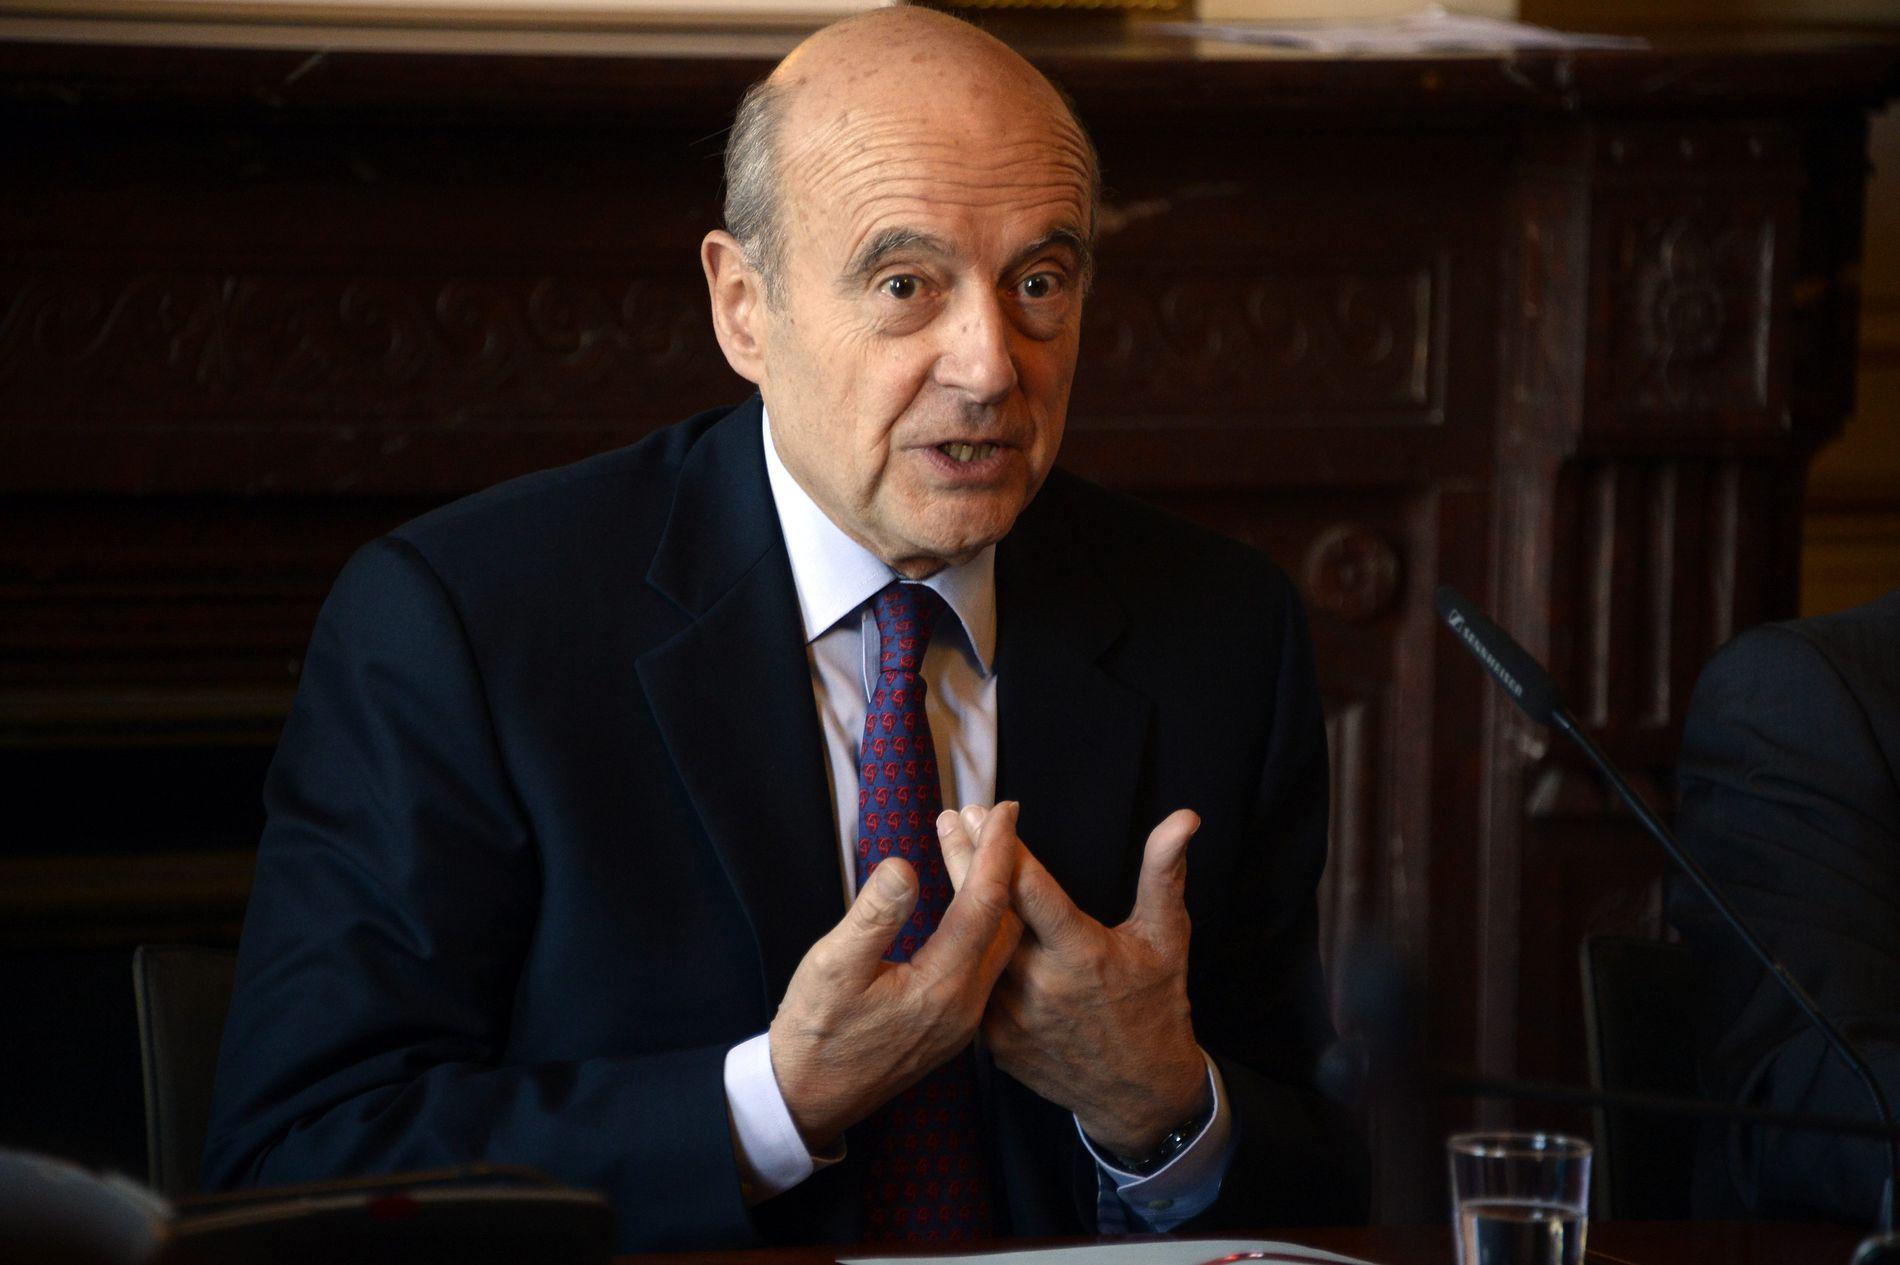 KANDIDAT OG ORDFØRER: Alain Juppé var statsminister under president Jacques Chirac fra 1995 til 1997 og er nå ordfører i Bordeaux.